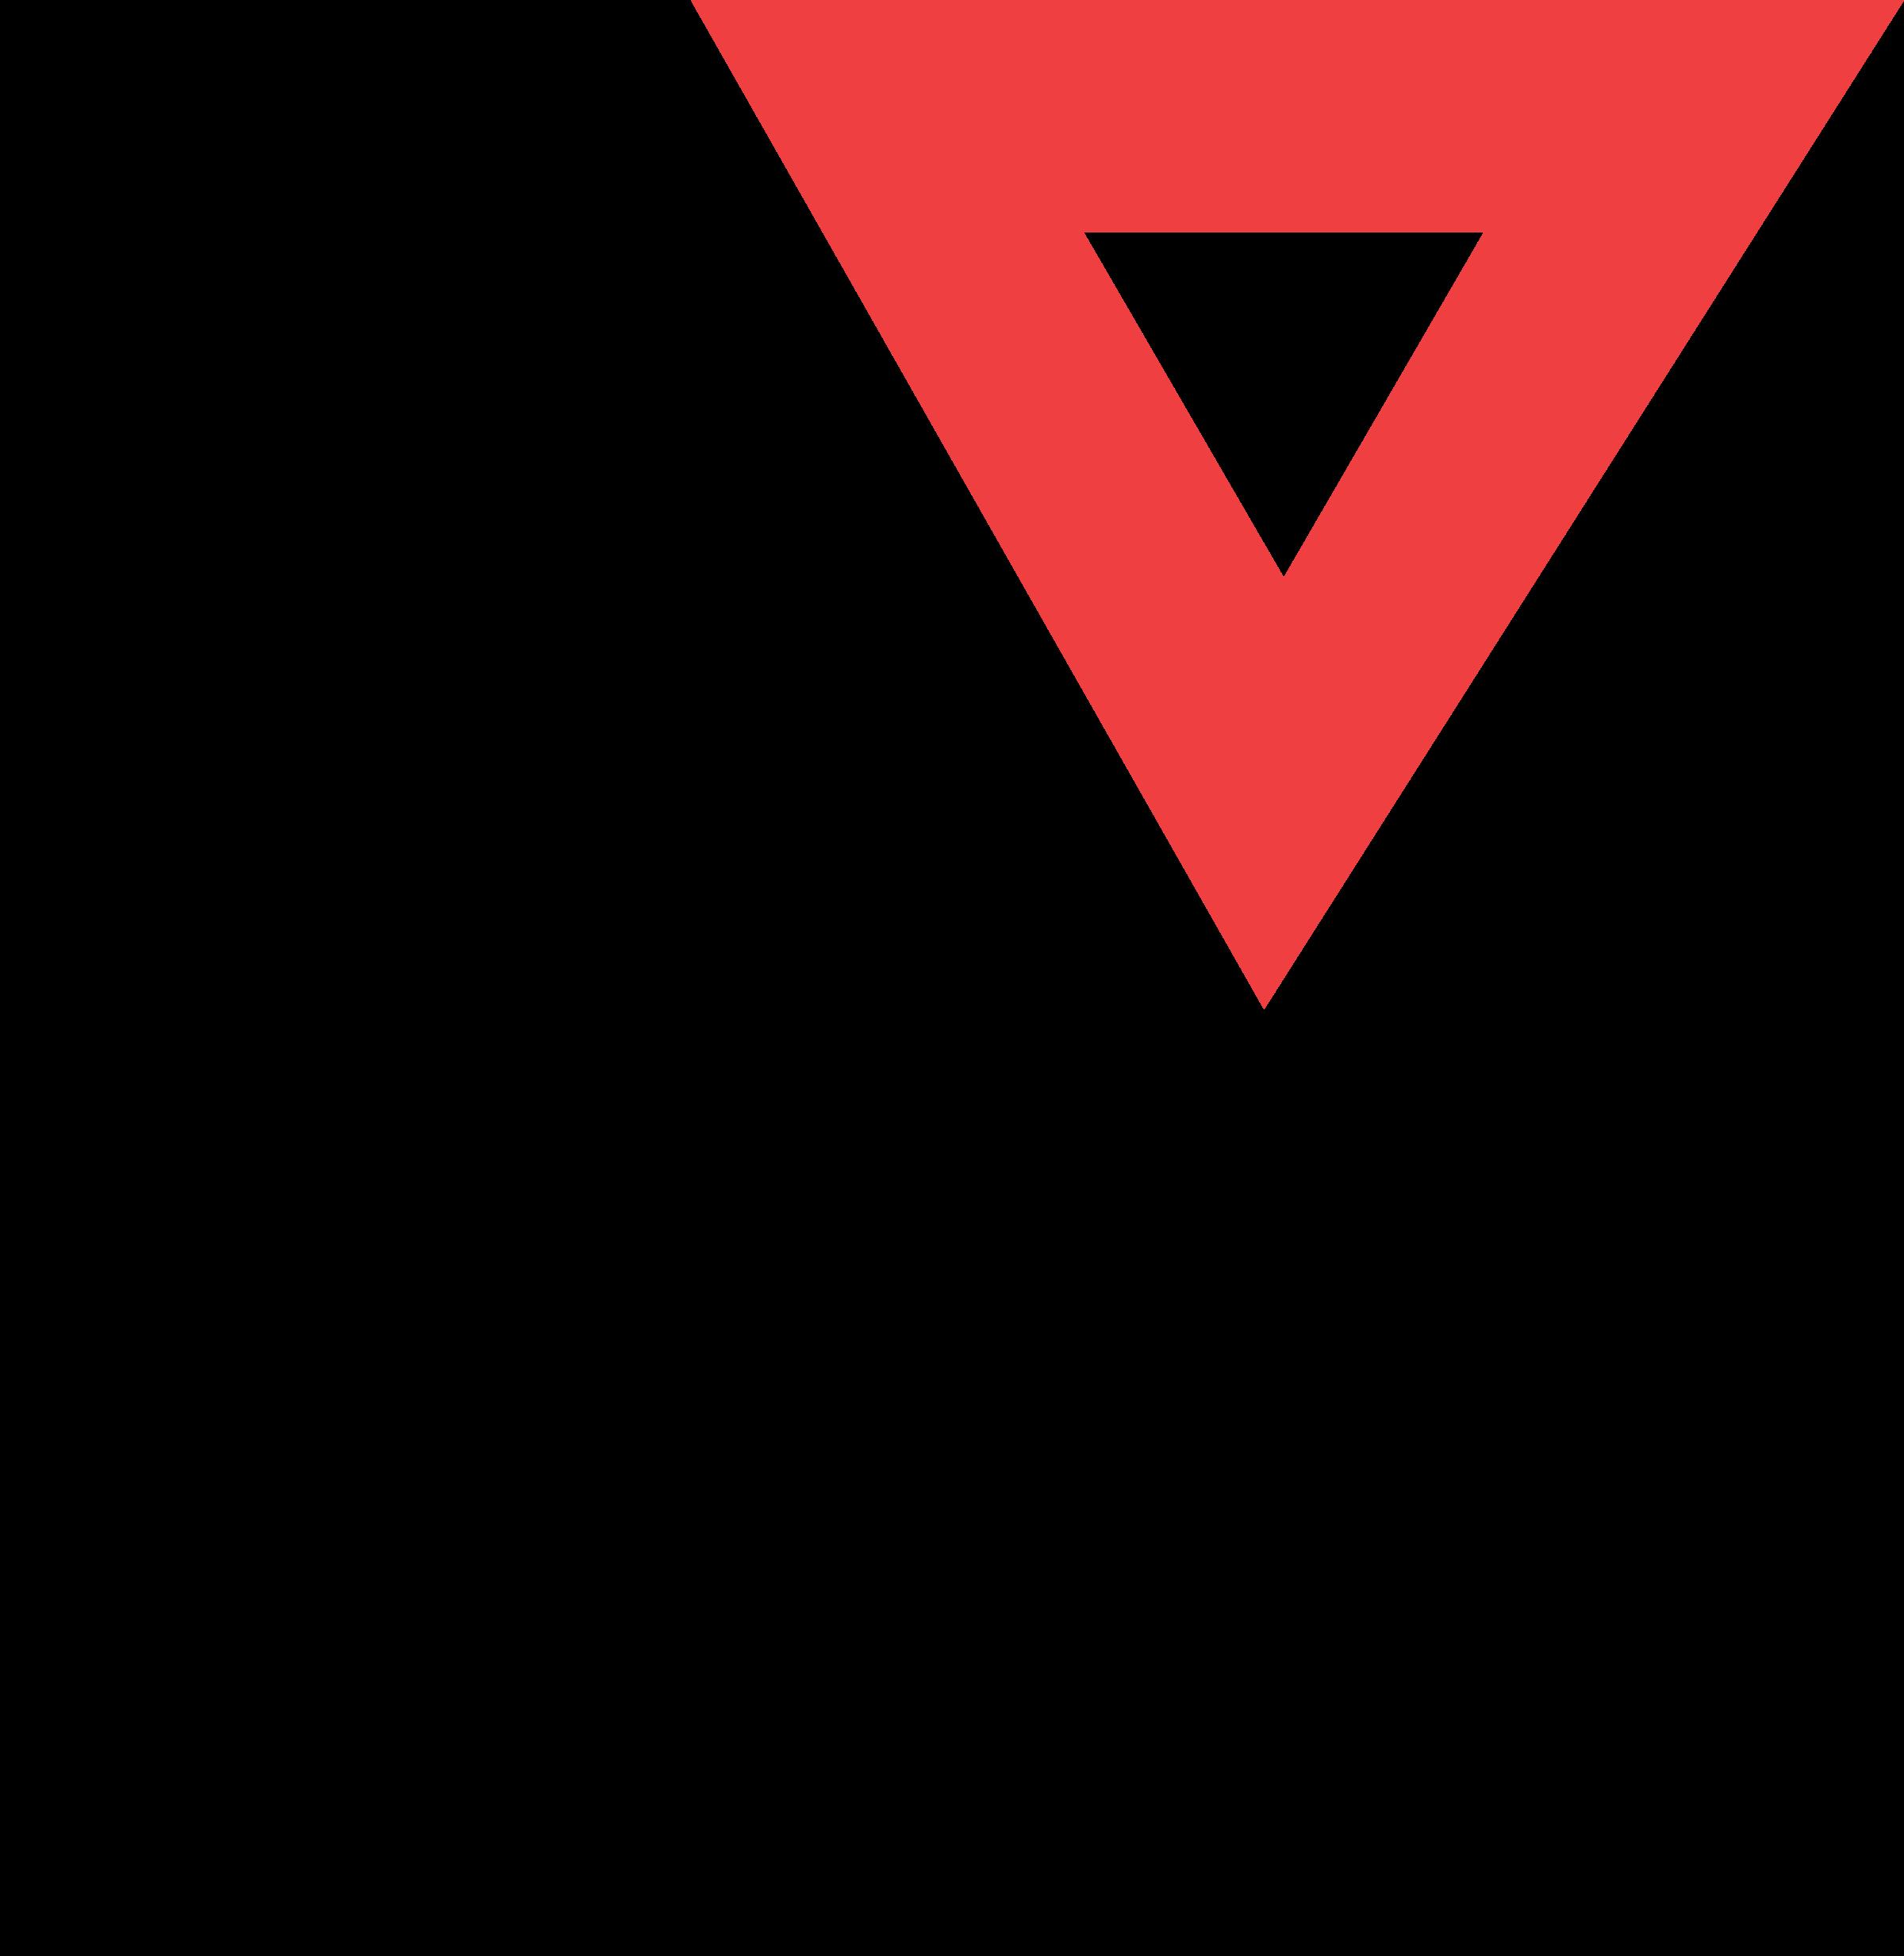 ymca logo png transparent svg vector freebie supply rh freebiesupply com ymca logo vector white